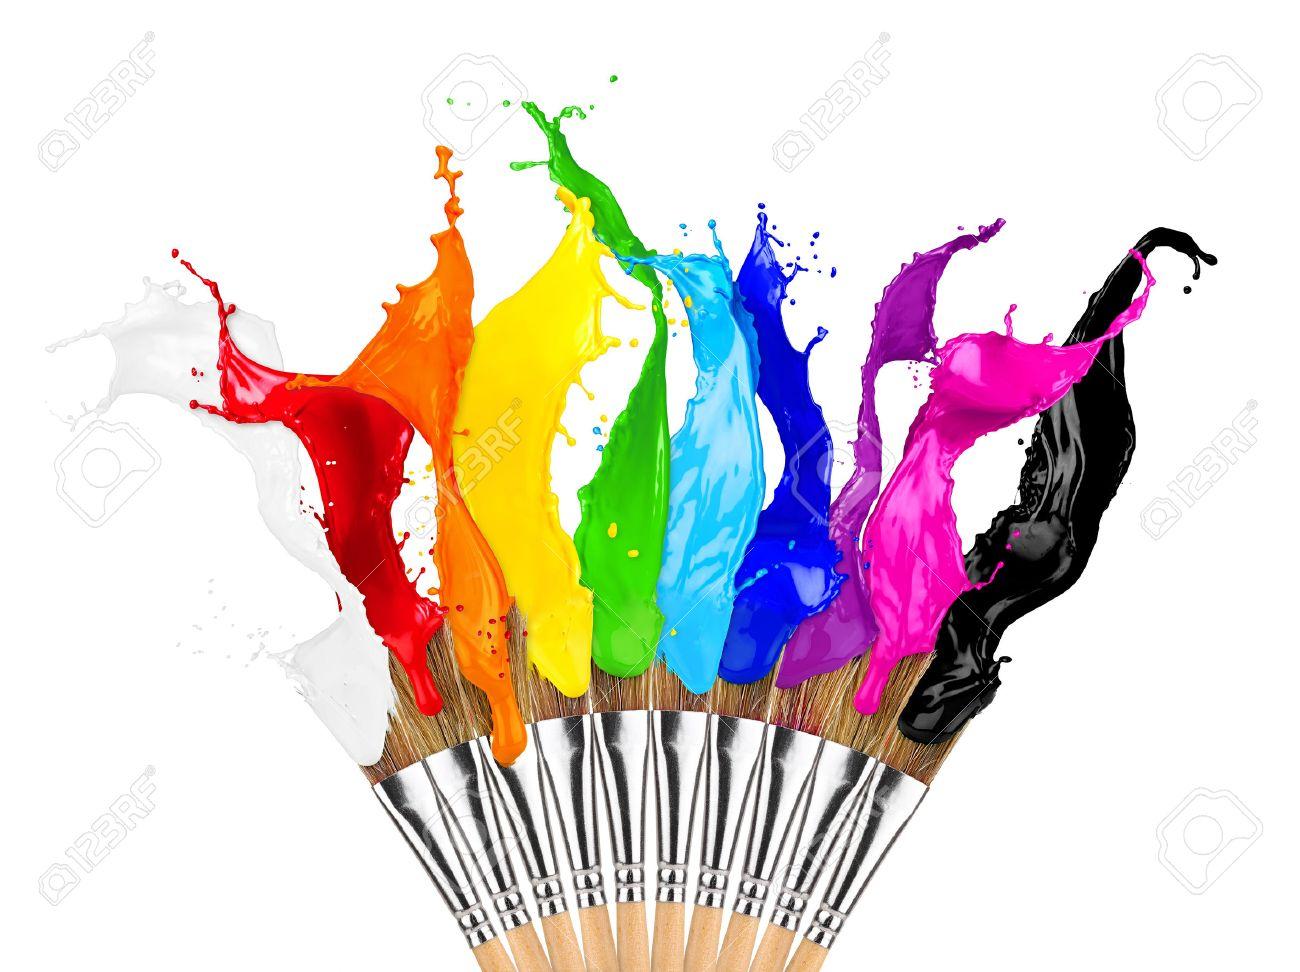 colorful color splashes paintbrush row isolated on white background - 54718977